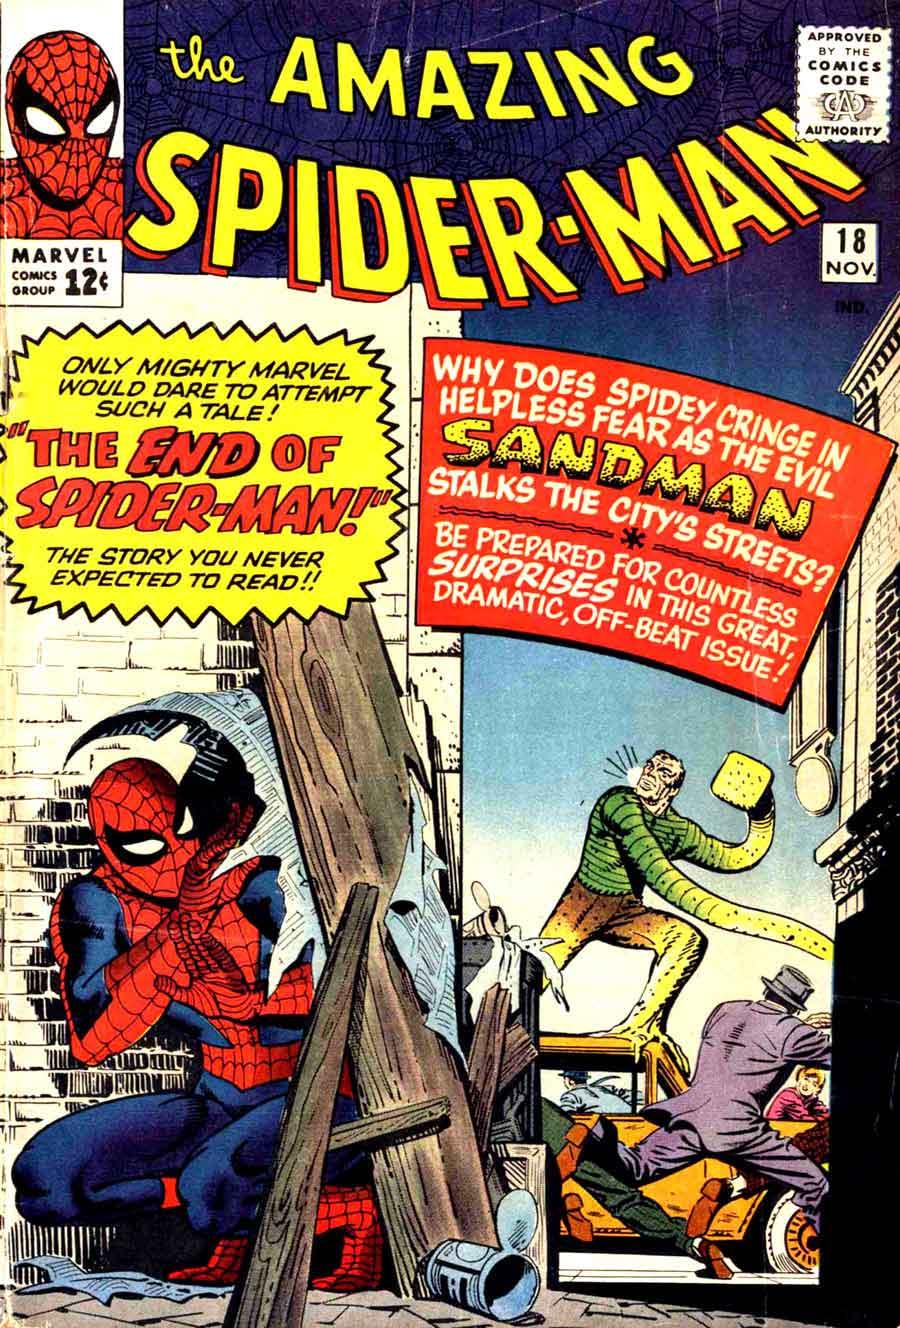 Amazing Spider-man #18 - Steve Ditko art & cover - Pencil Ink